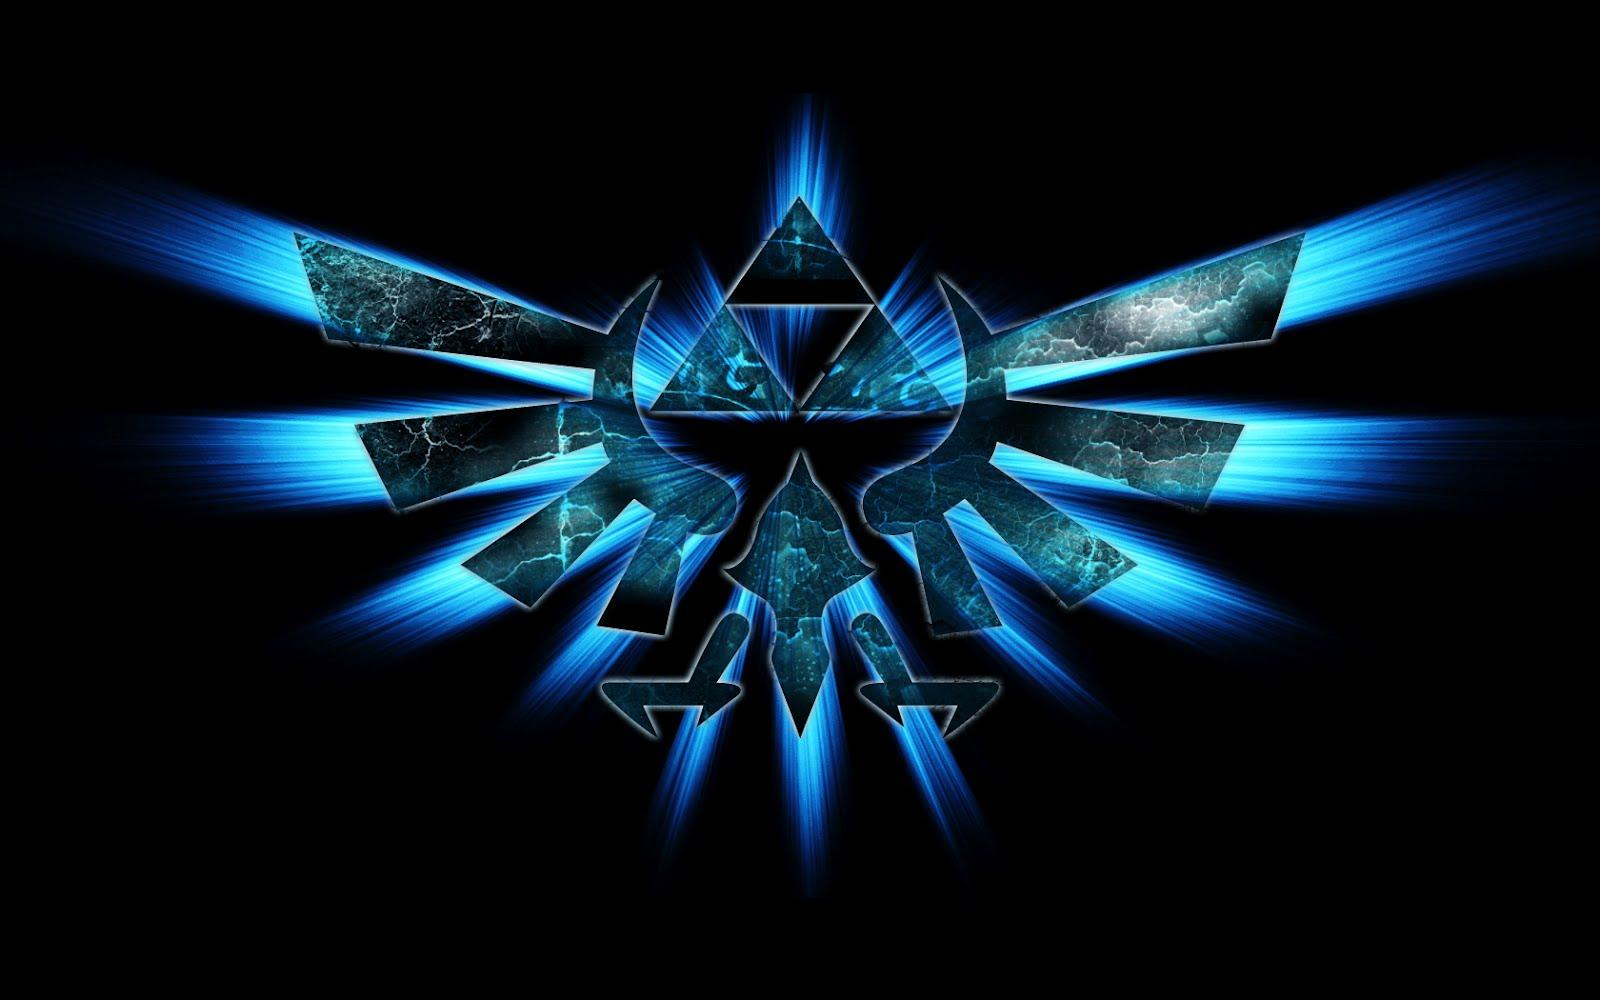 Blue Logo Symbol Cool Wallpaper 2116 Wallpaper Cool Walldiskpaper 1600x1000